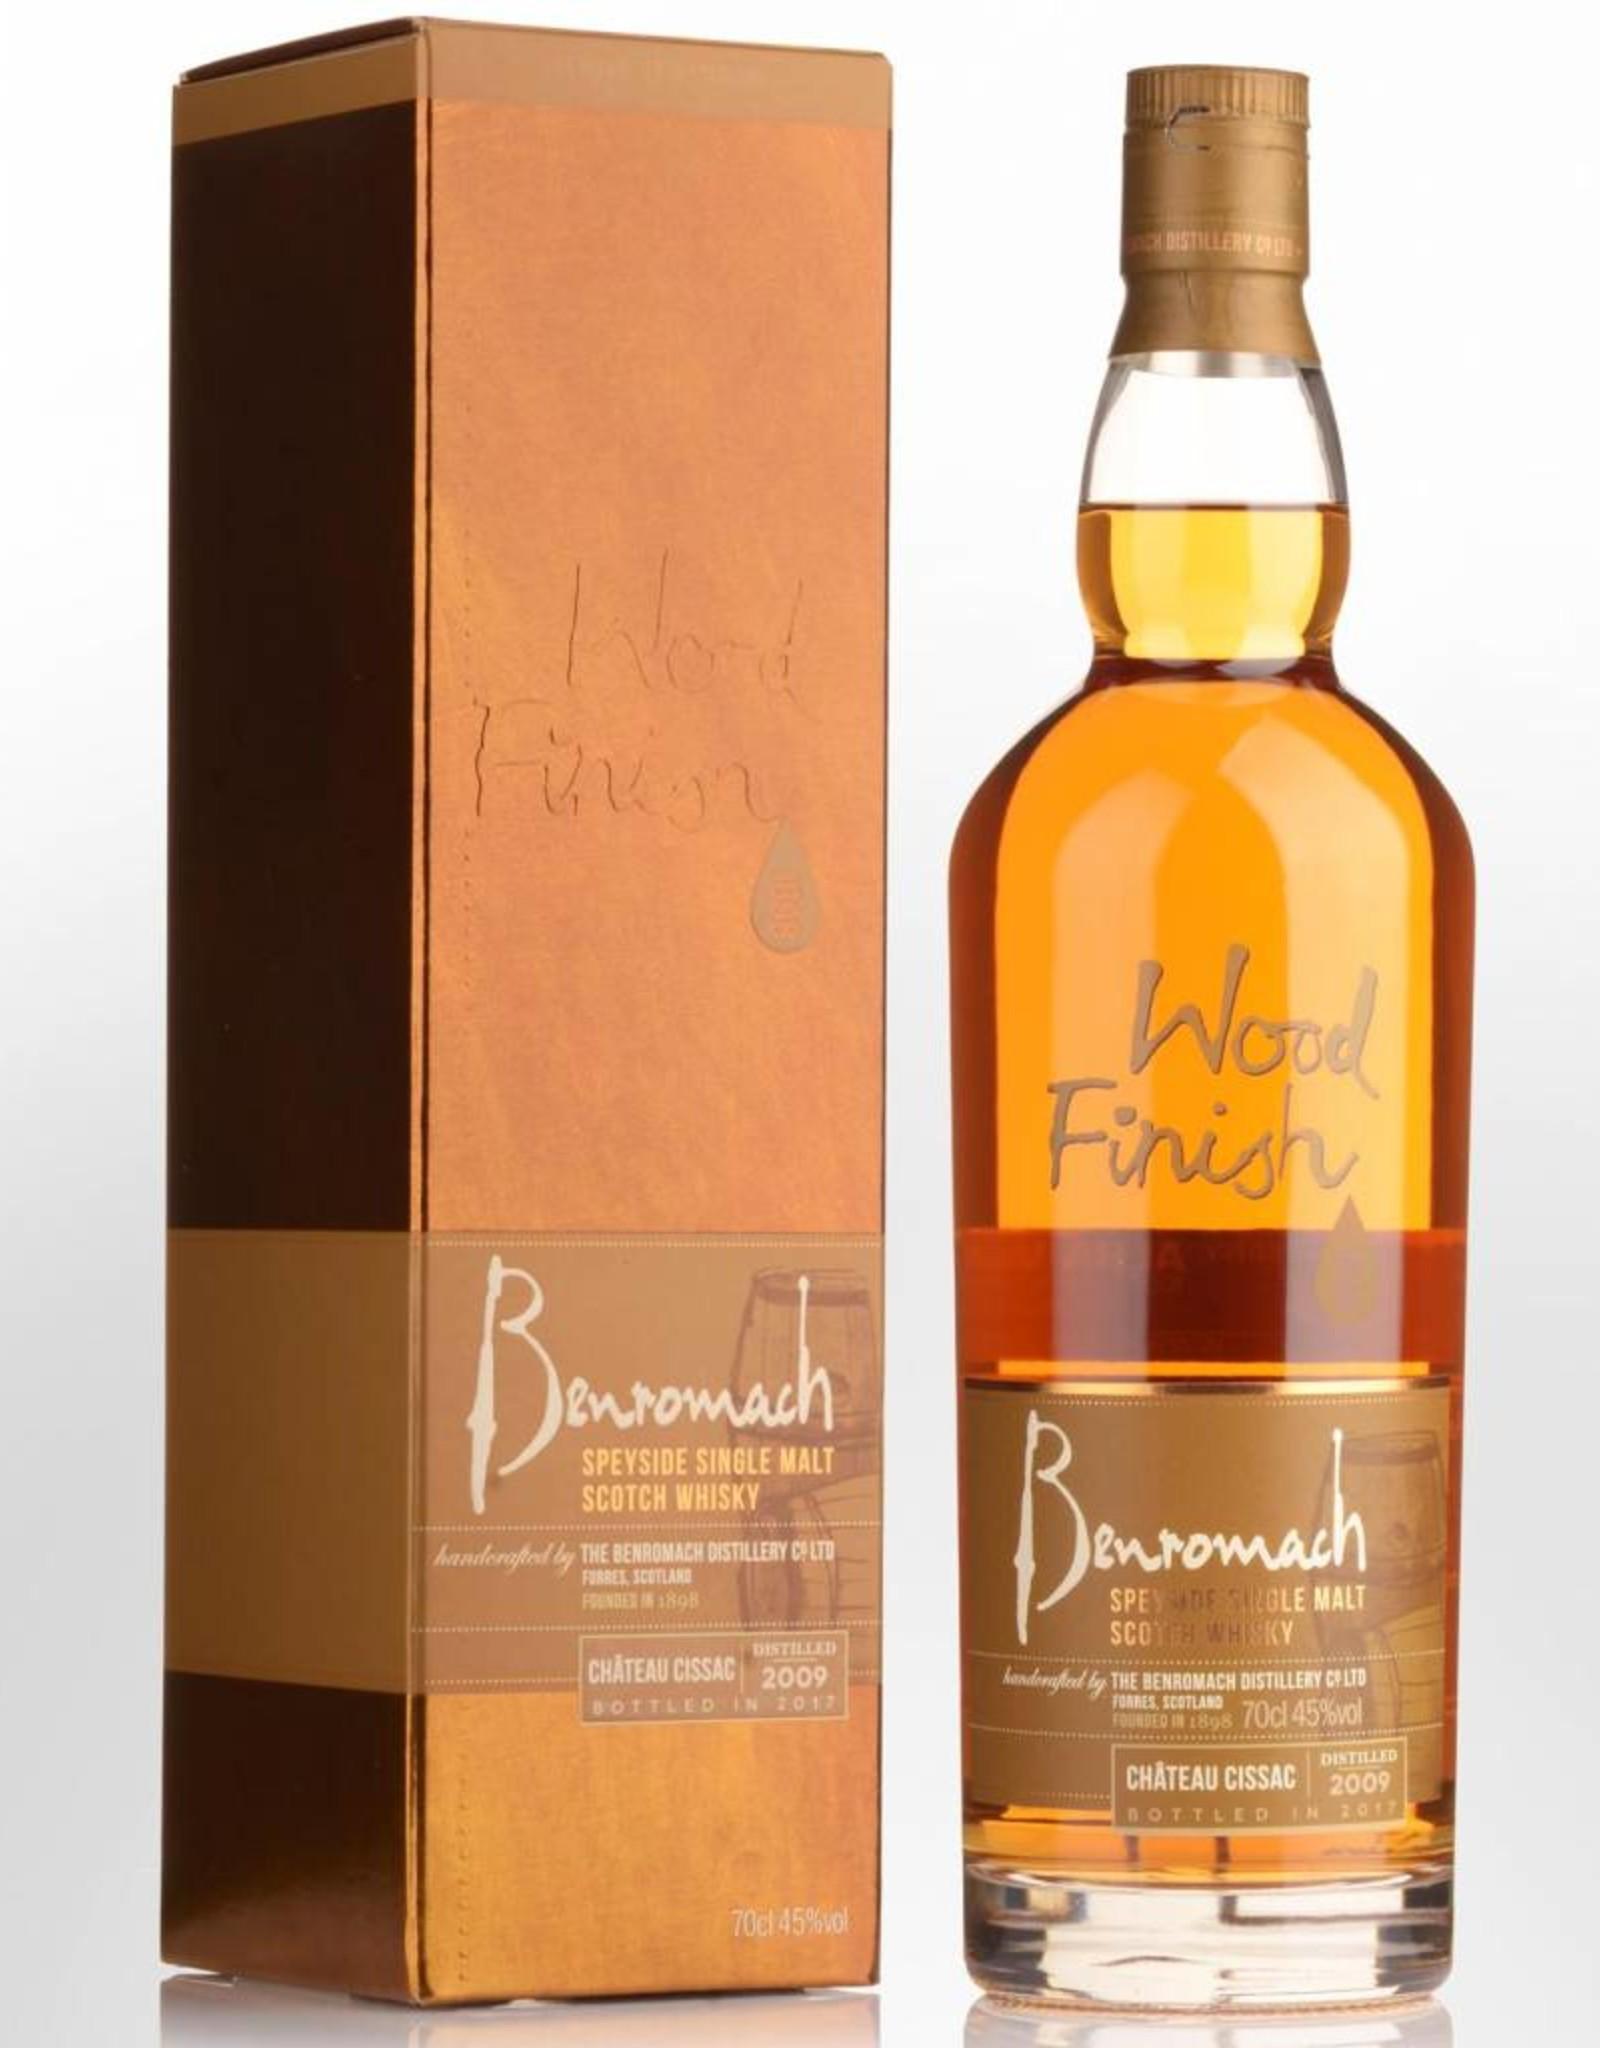 Benromach Chateau Cissax 2009, Whisky, 45%, 700 ml